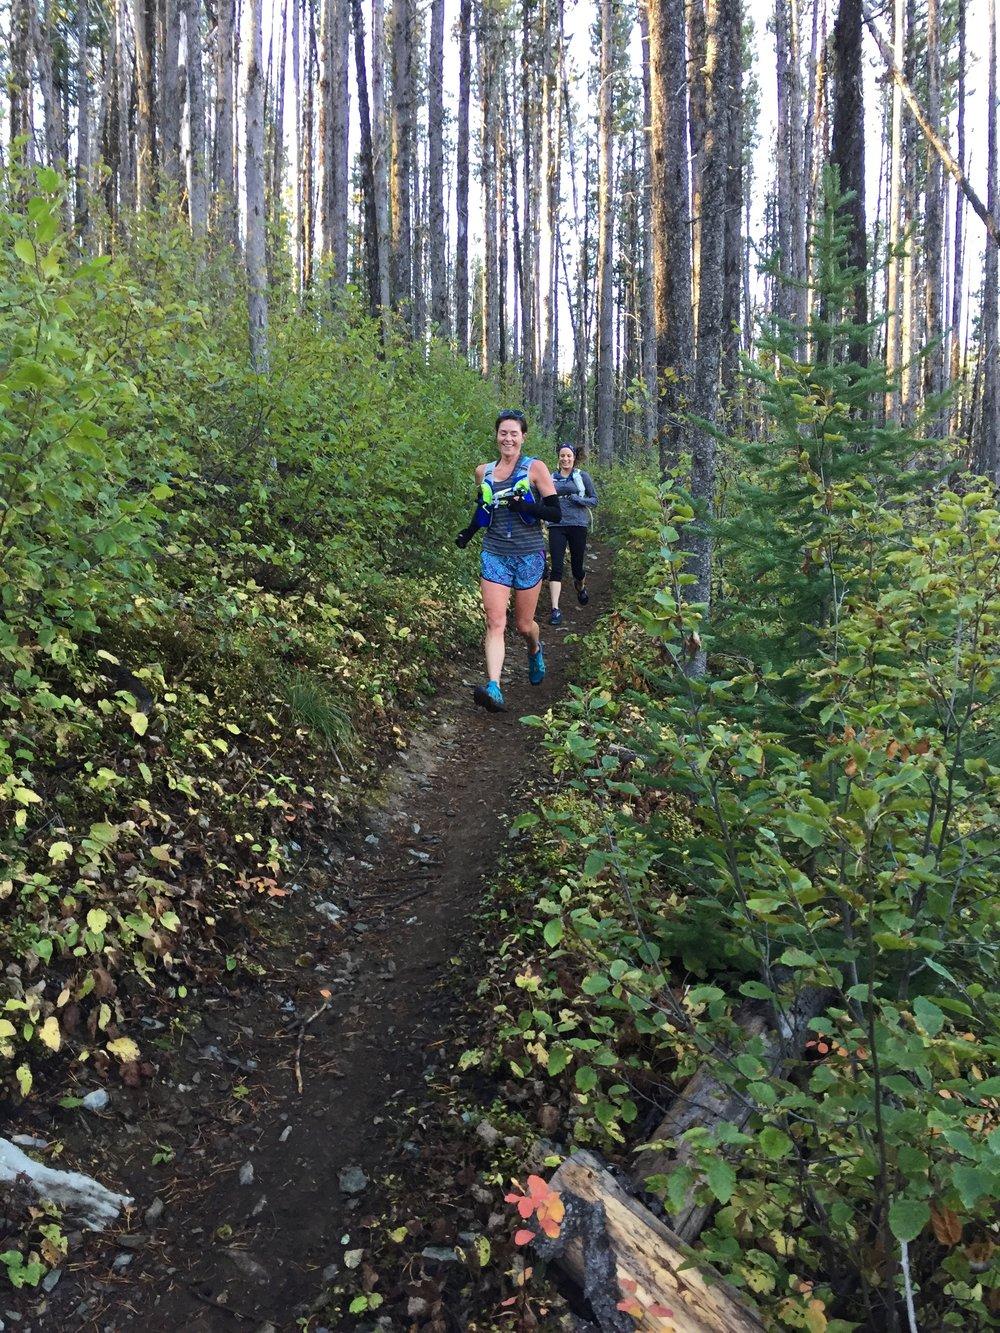 foys to blacktail trails trail marathon ftbtIMG_1051.JPG